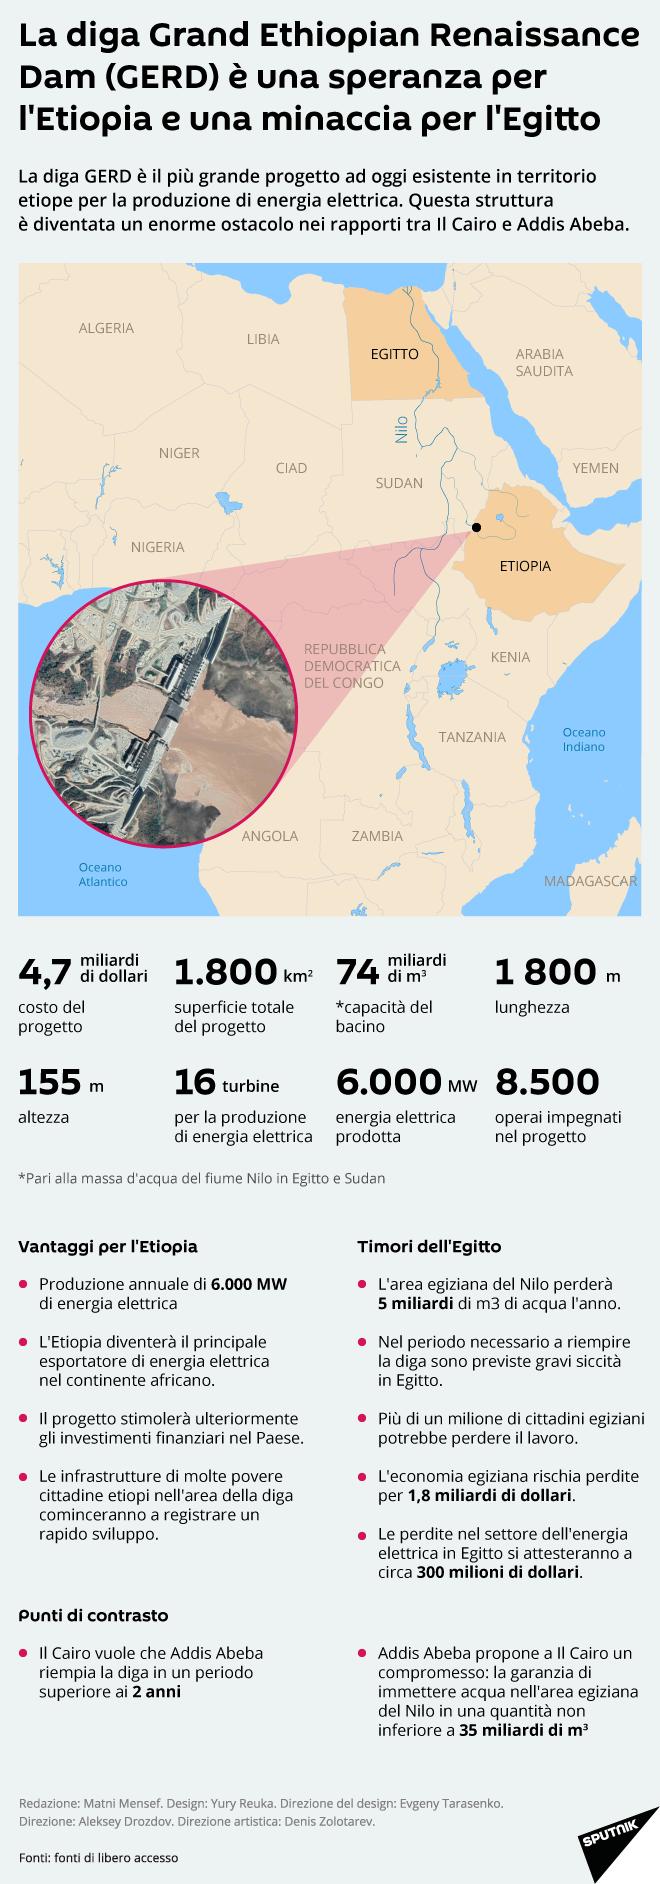 La diga Grand Ethiopian Renaissance Dam (GERD) è una speranza per l'Etiopia e una minaccia per l'Egitto - Sputnik Italia